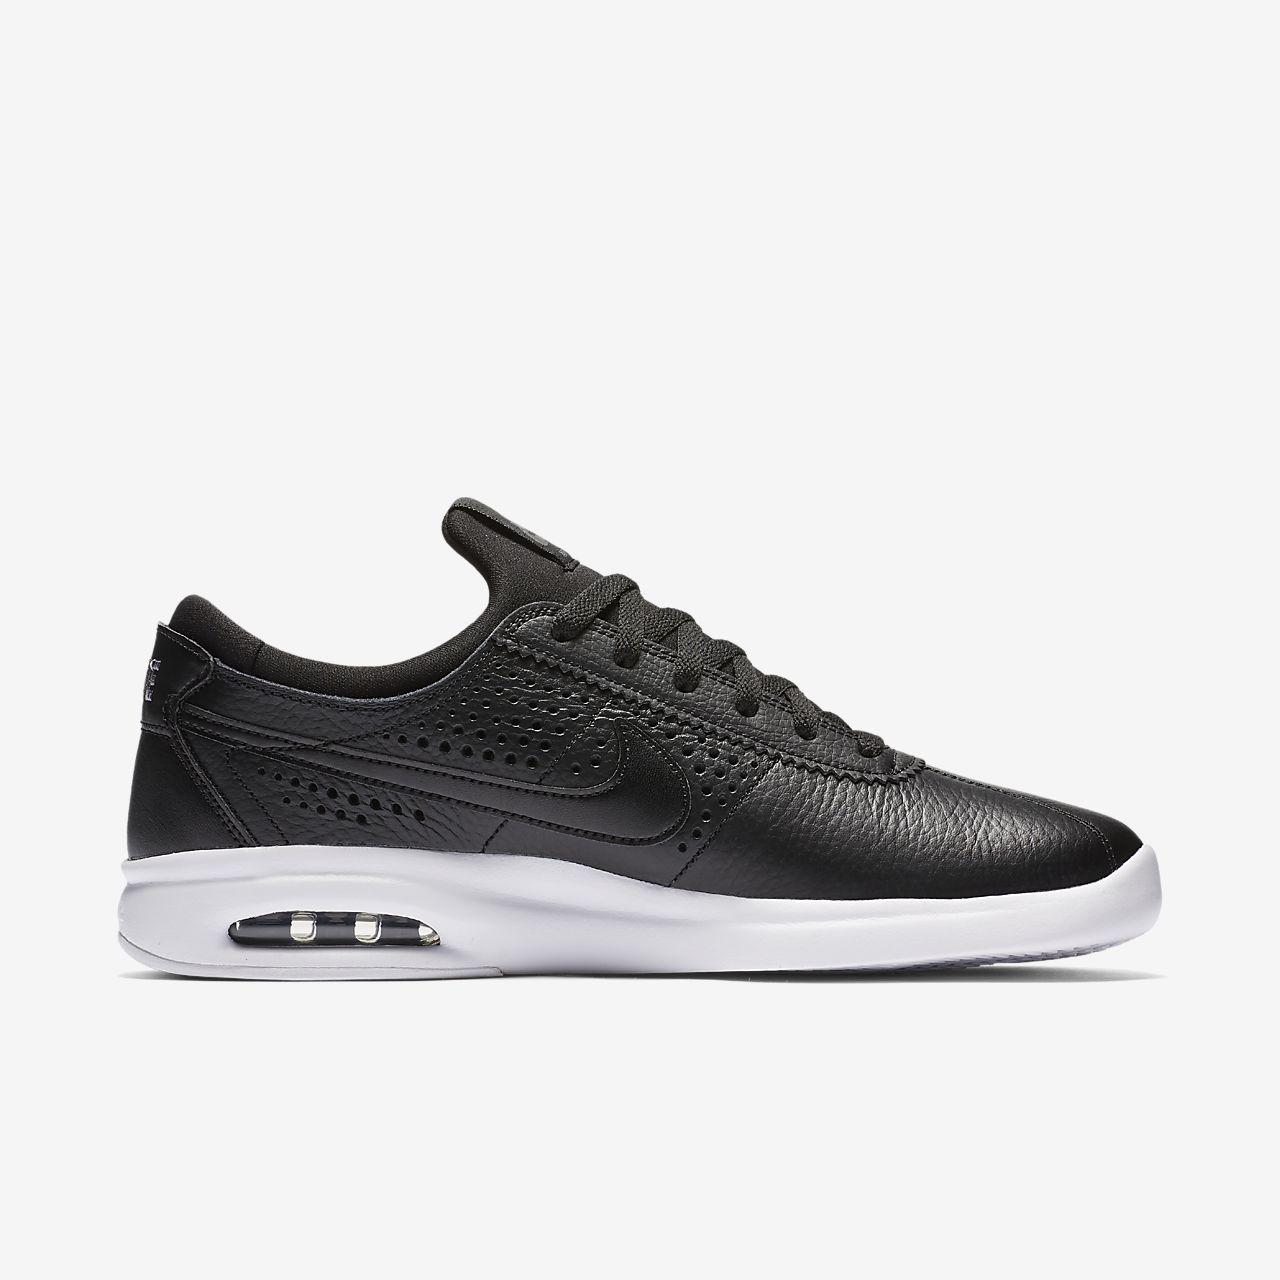 ... Nike SB Air Max Bruin Vapor Leather Men's Skateboarding Shoe